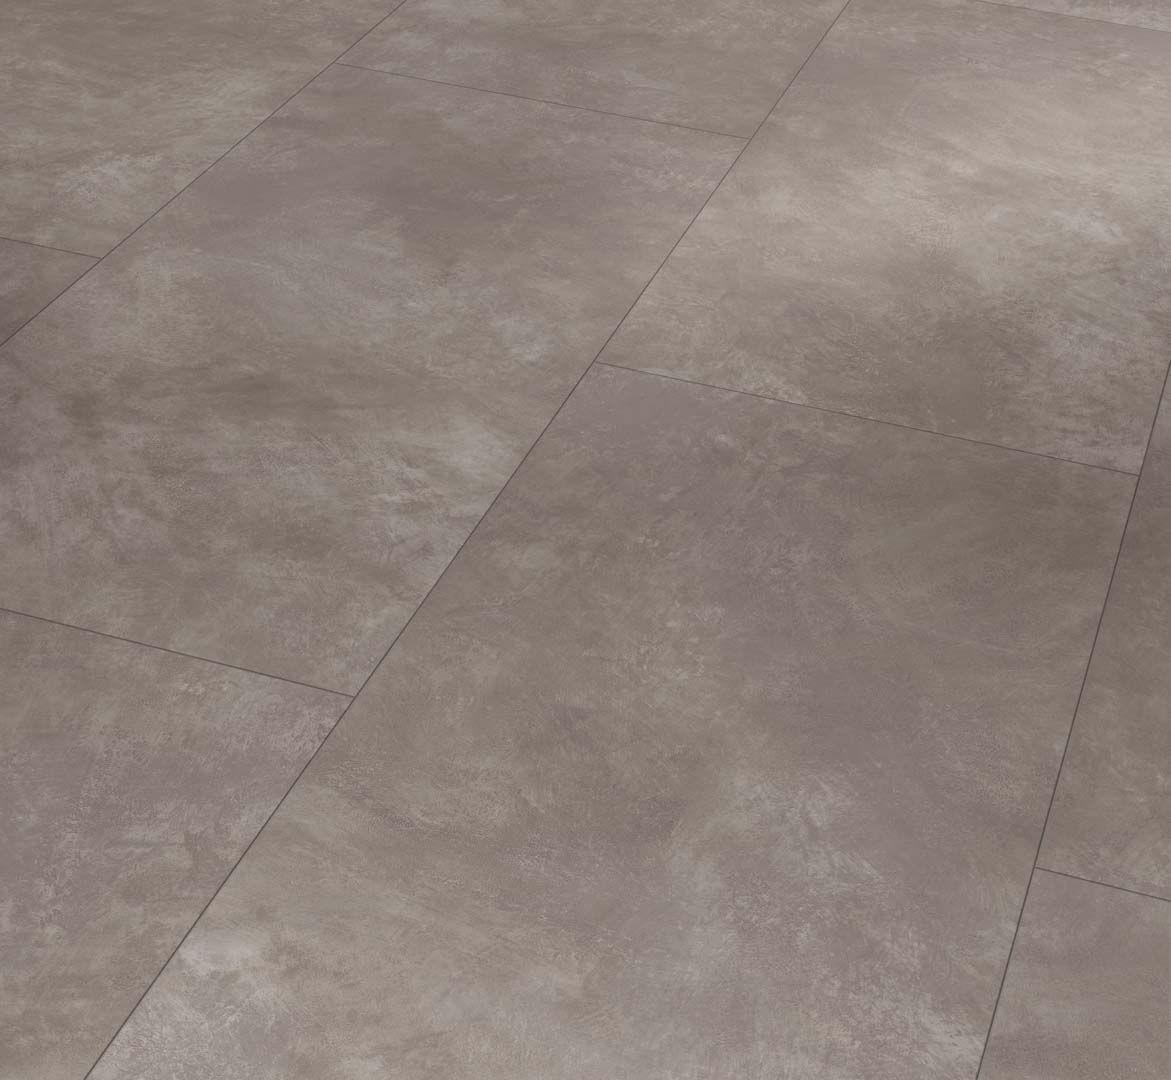 PARADOR Vinylboden Beton dunkelgrau Steinstruktur 4-seitige Fase | Modular ONE